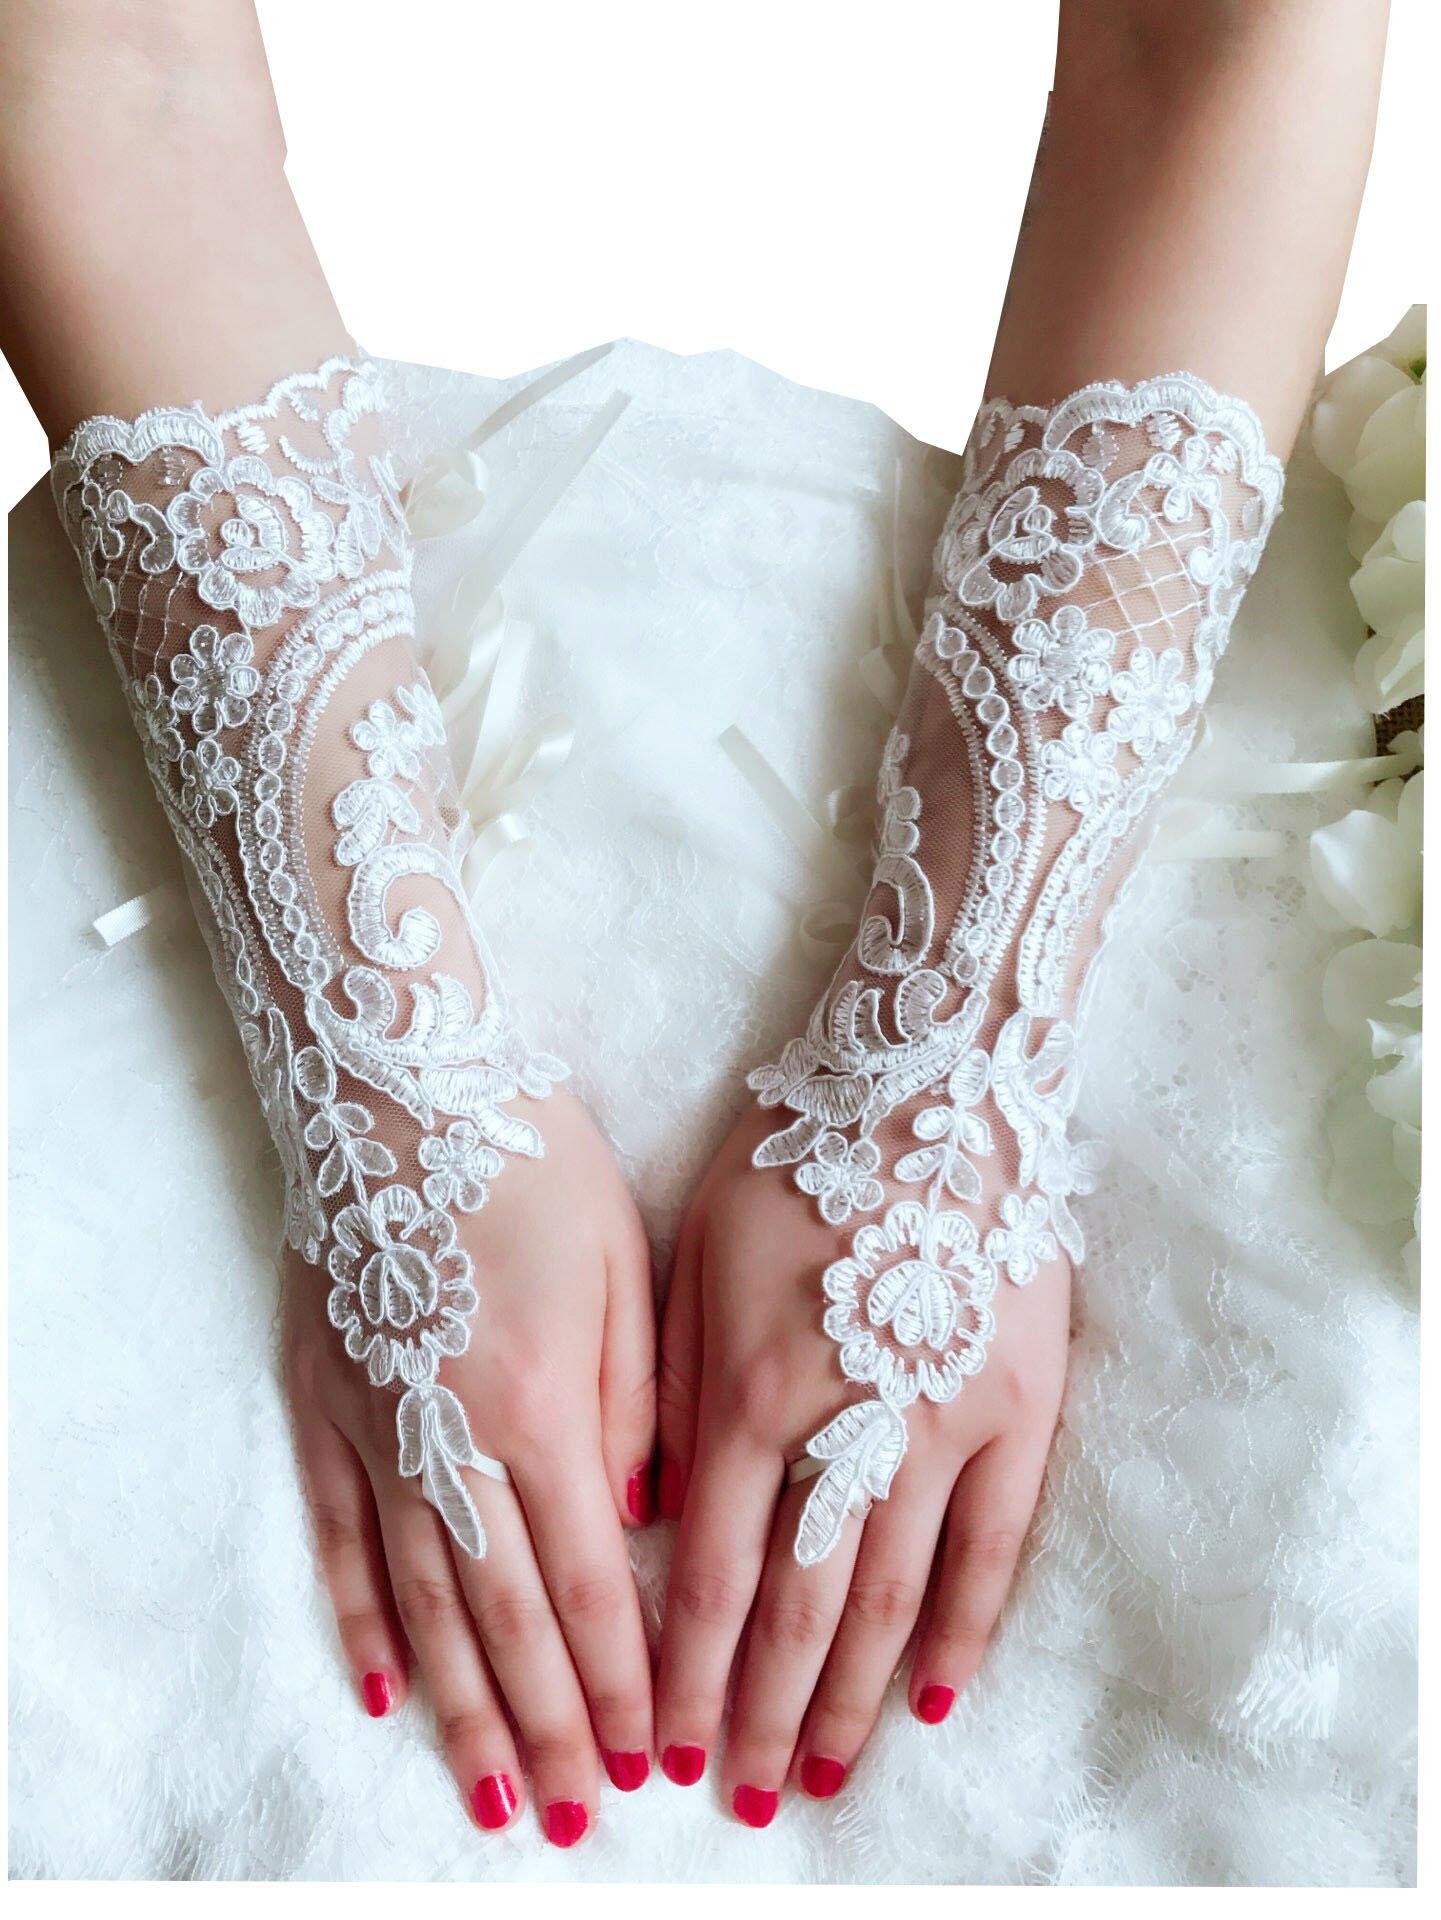 YuRong Elegance Wedding Gloves Bridal Gloves Lace Gloves Fingerless A03 (Ivory)